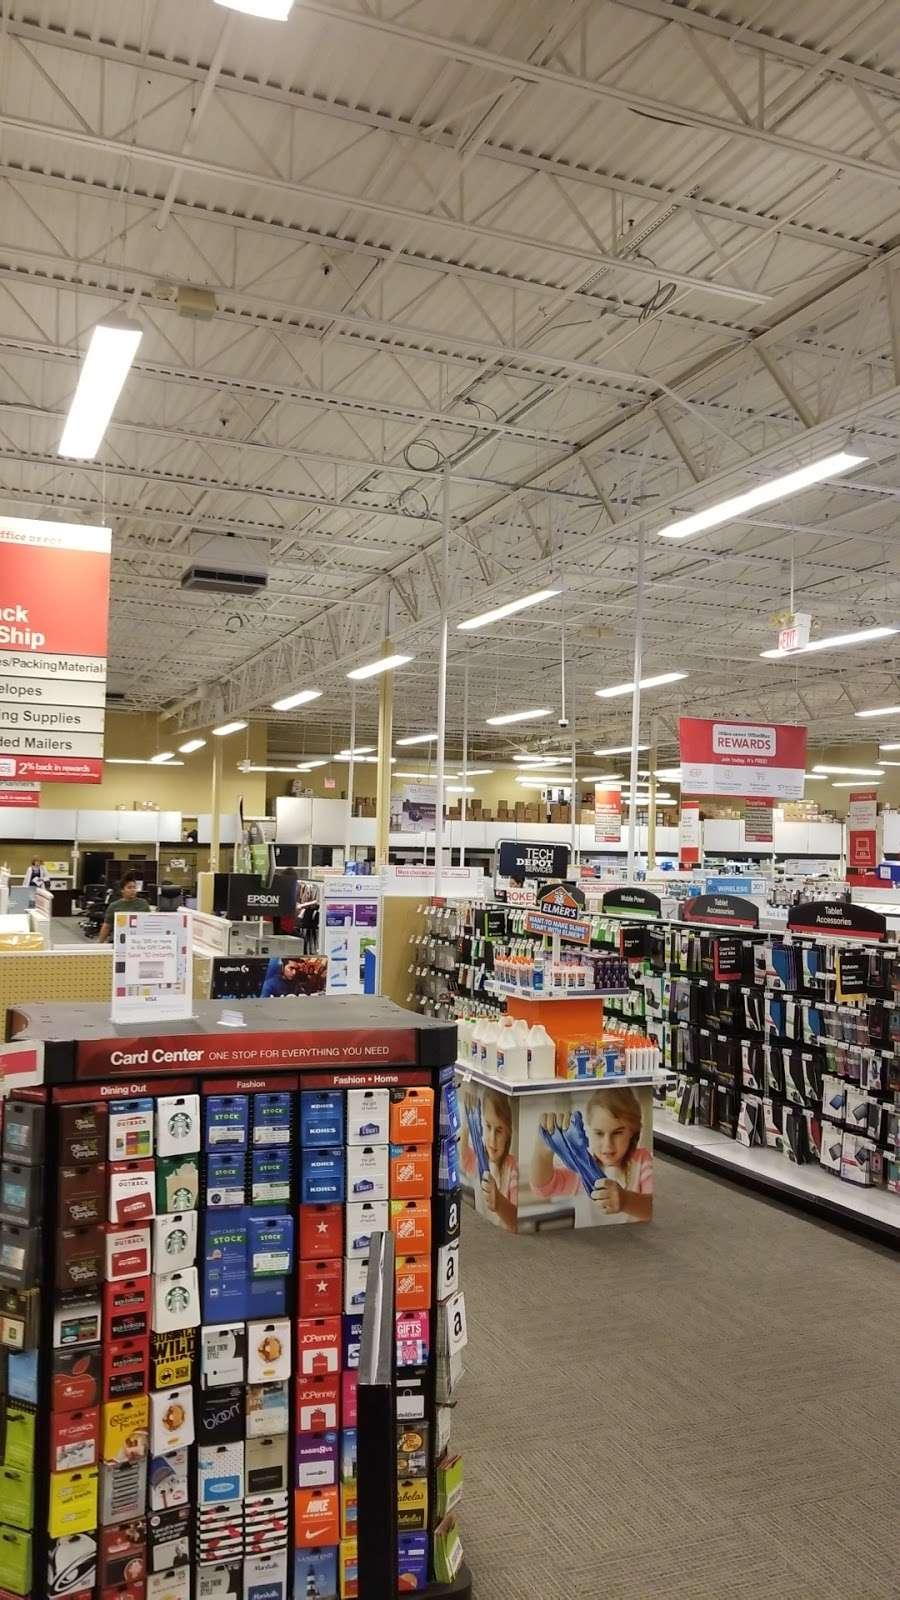 Office Depot - furniture store  | Photo 1 of 10 | Address: 4615 Garth Rd, Baytown, TX 77521, USA | Phone: (281) 837-8101